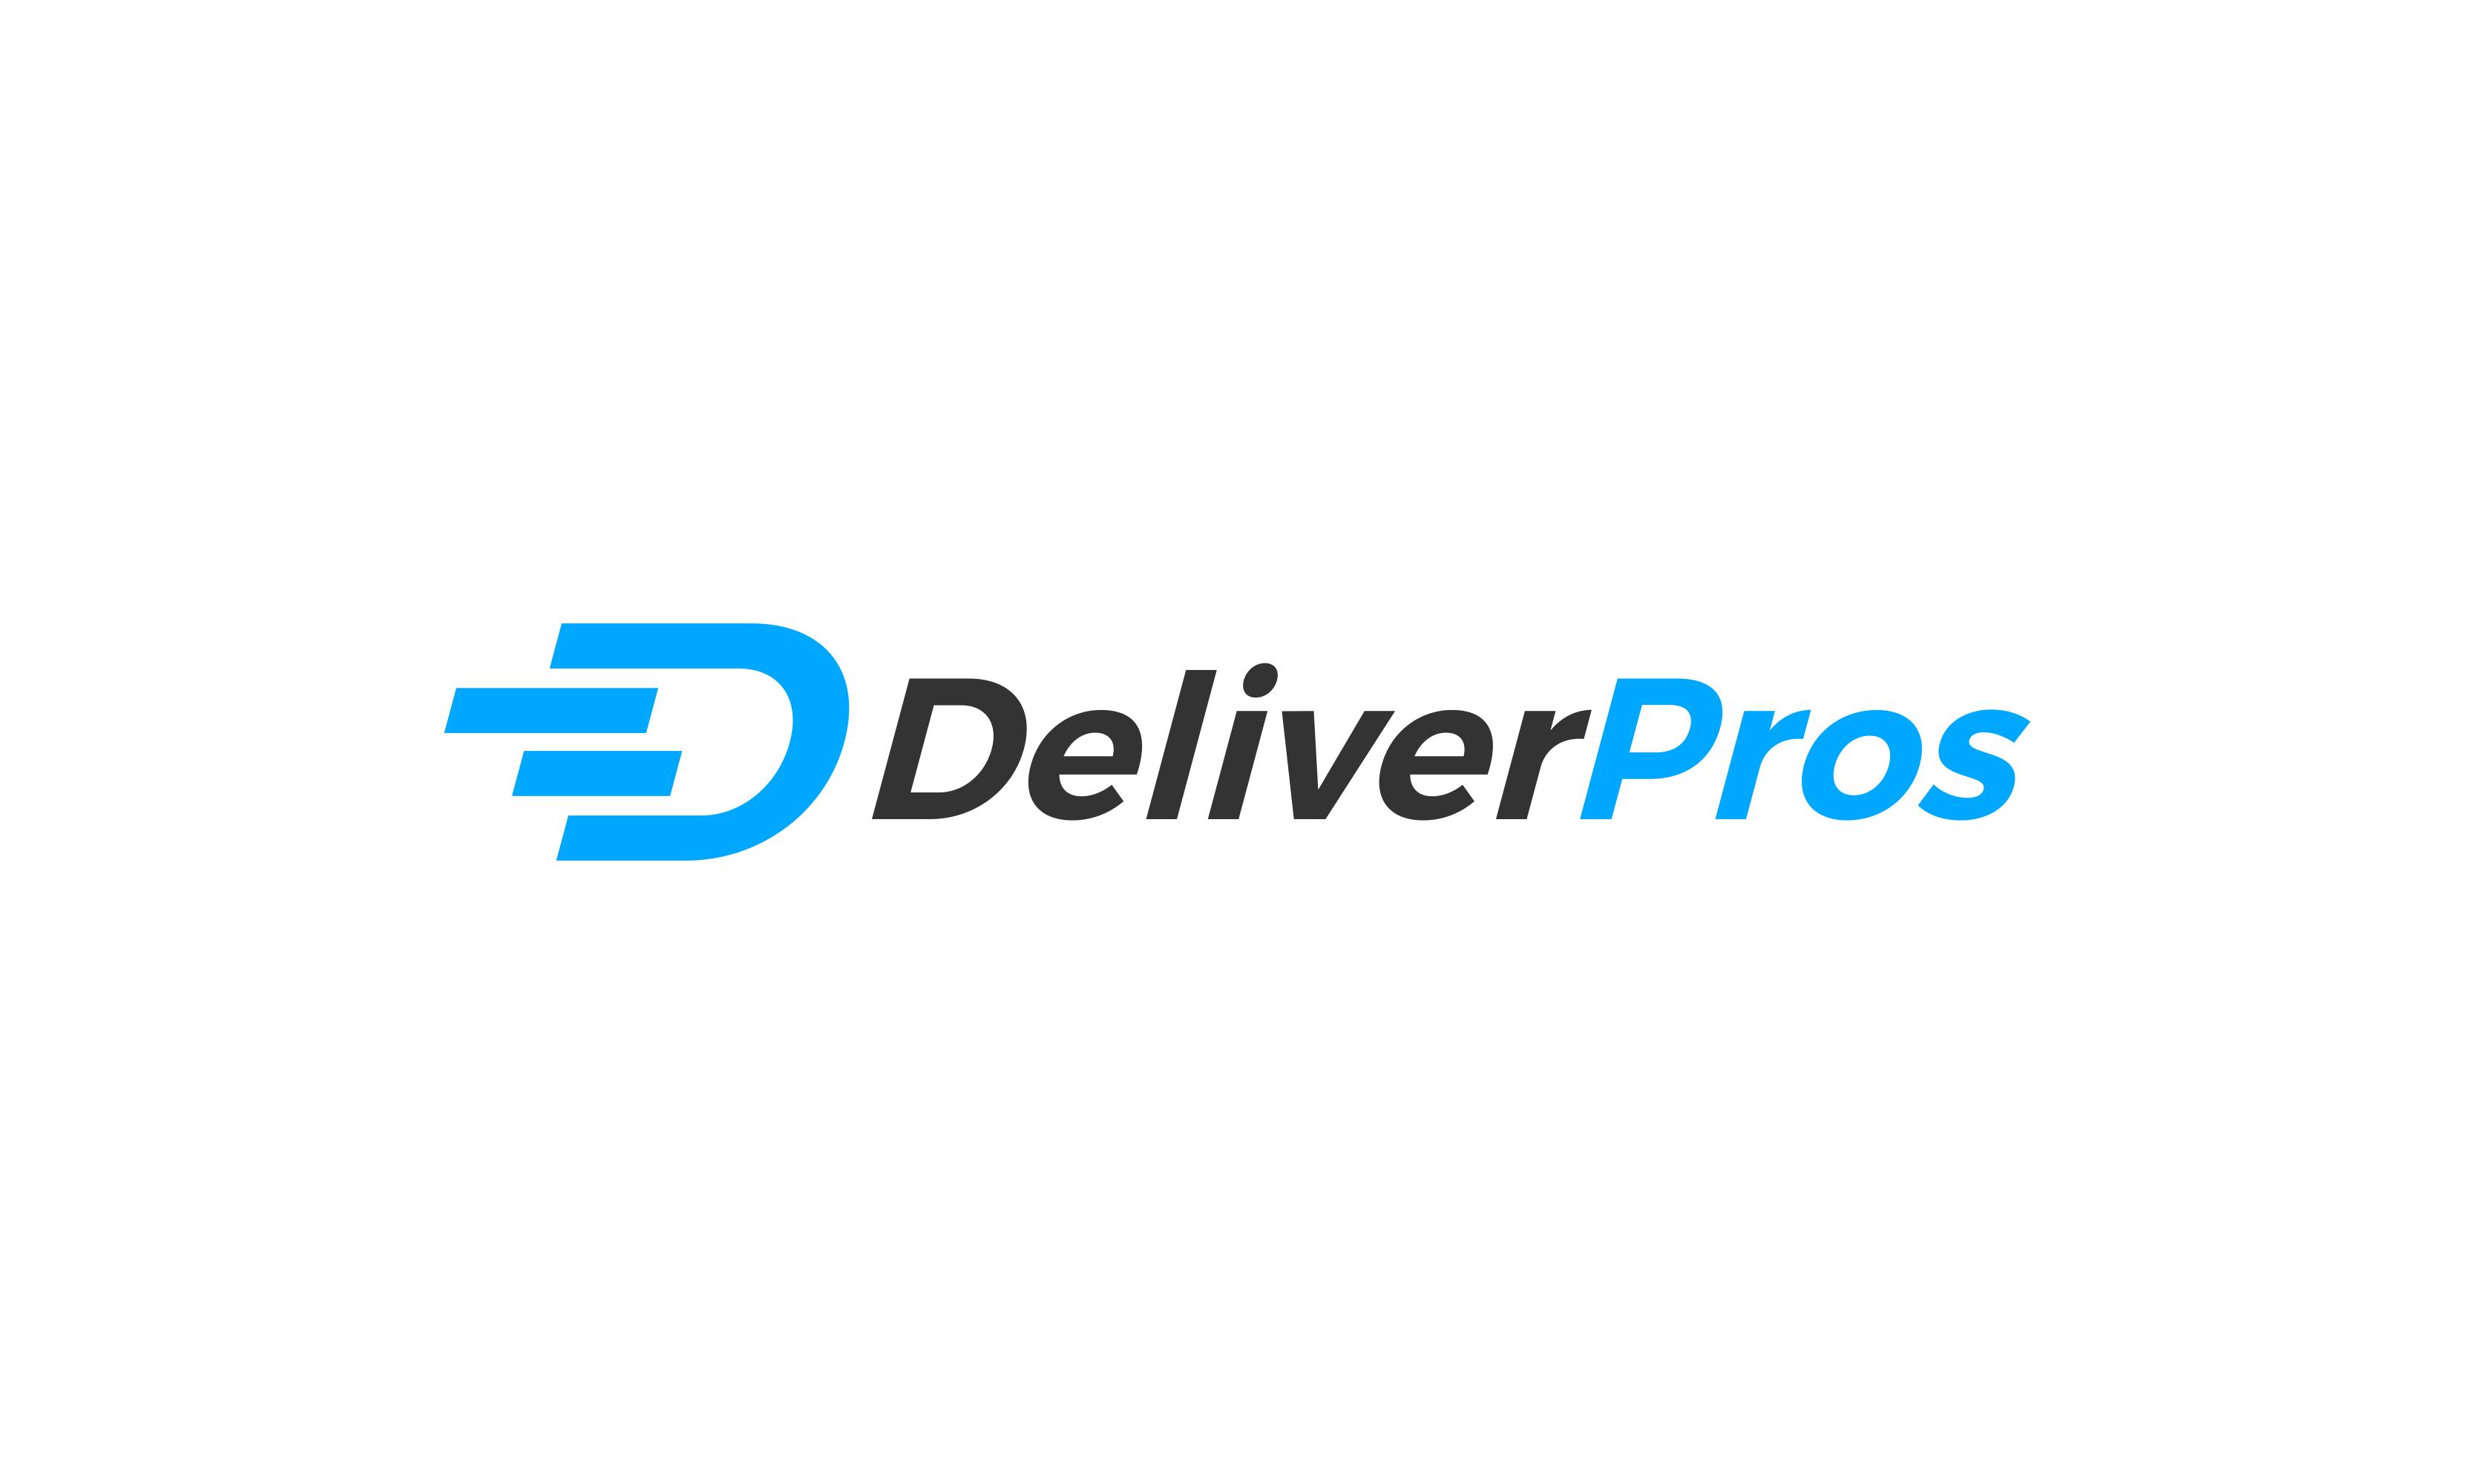 Deliverpros - Delivery domain name for sale